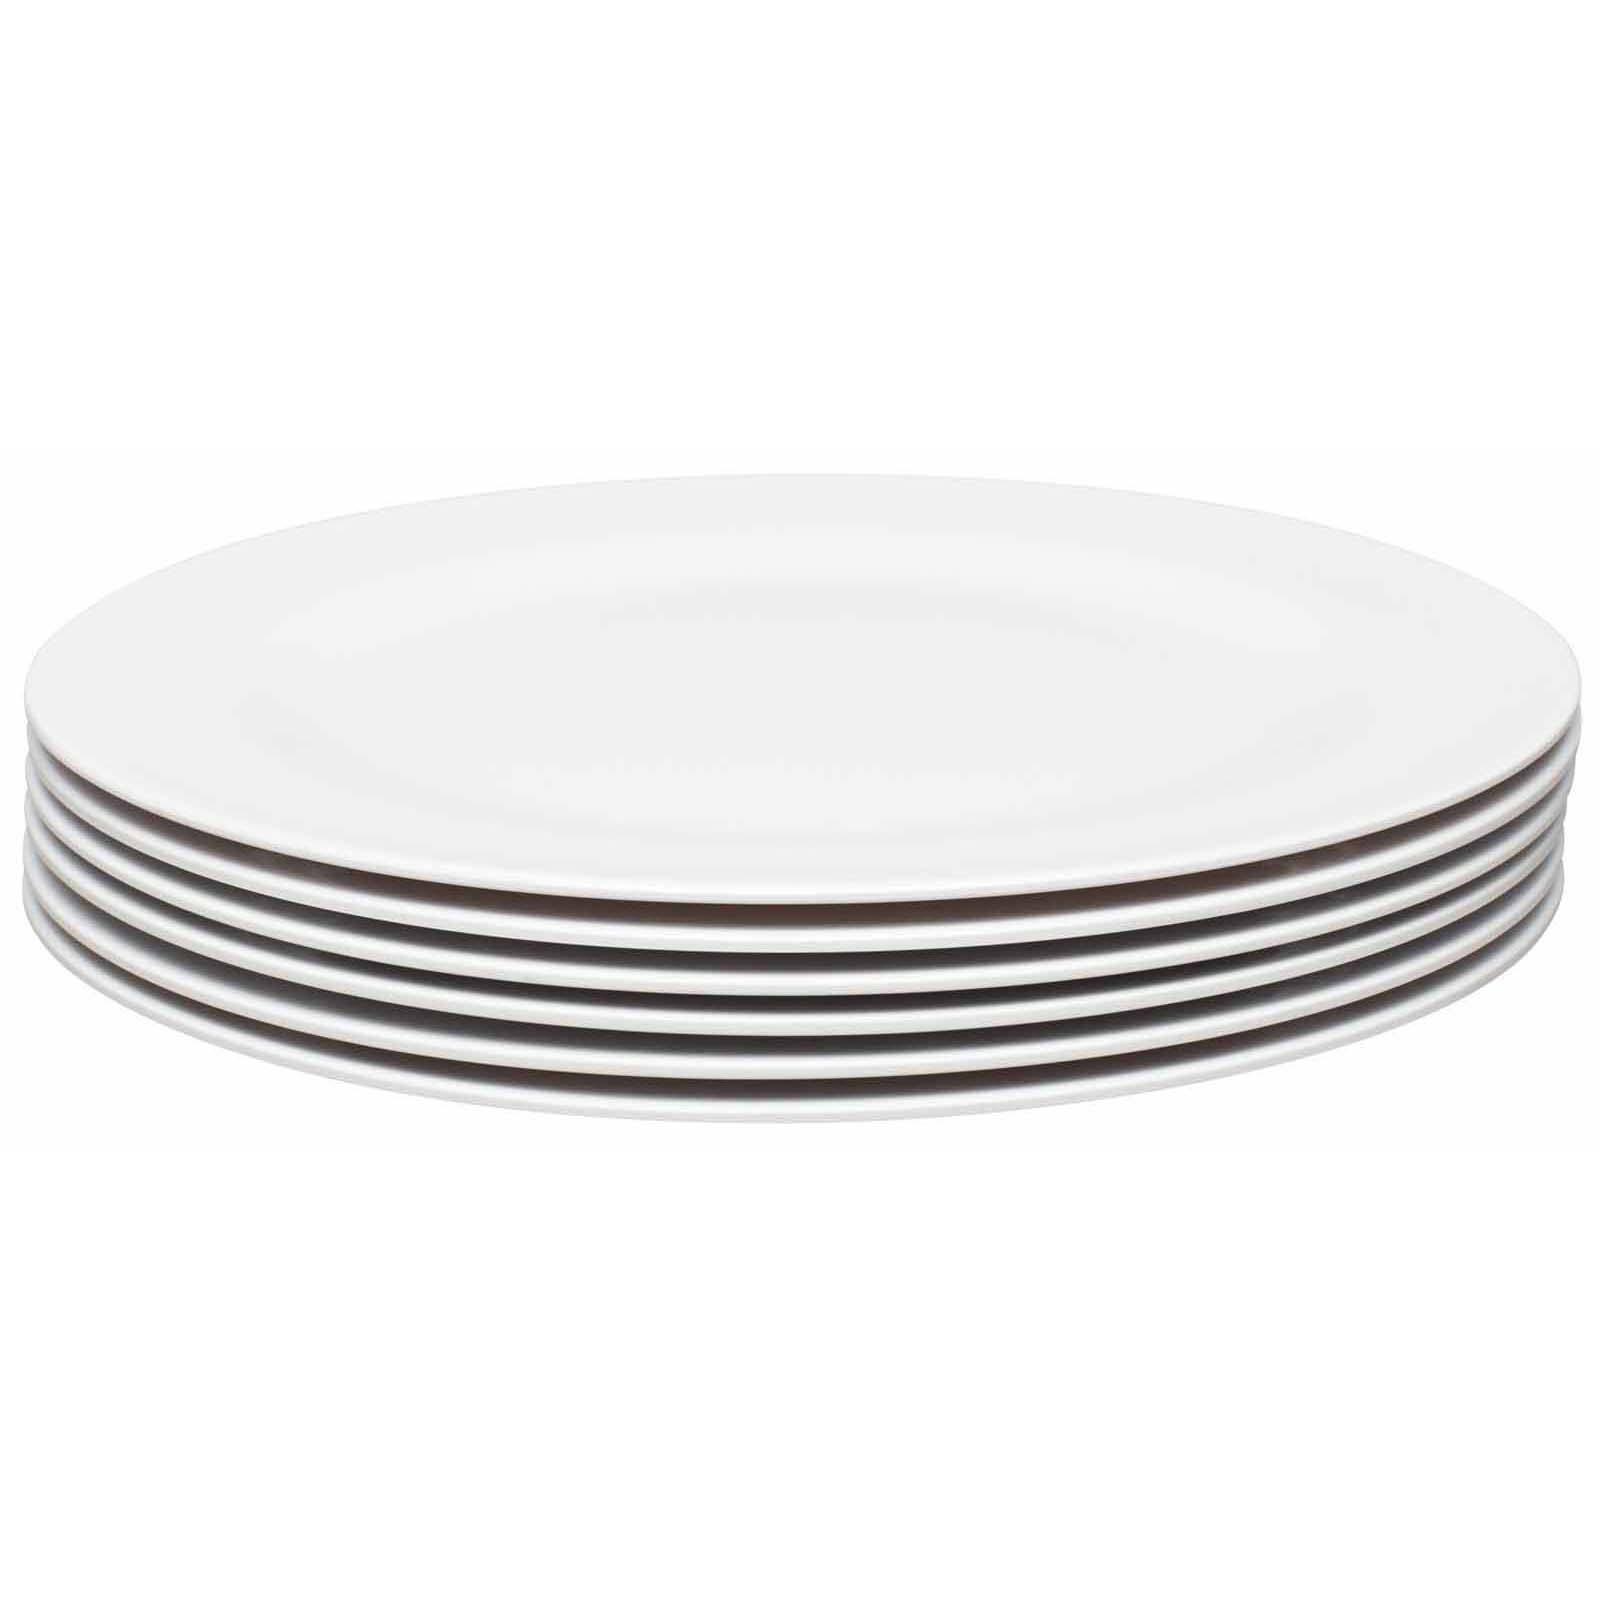 Ella Salad Plate, Eggshell White, 6-piece set slideshow image 2